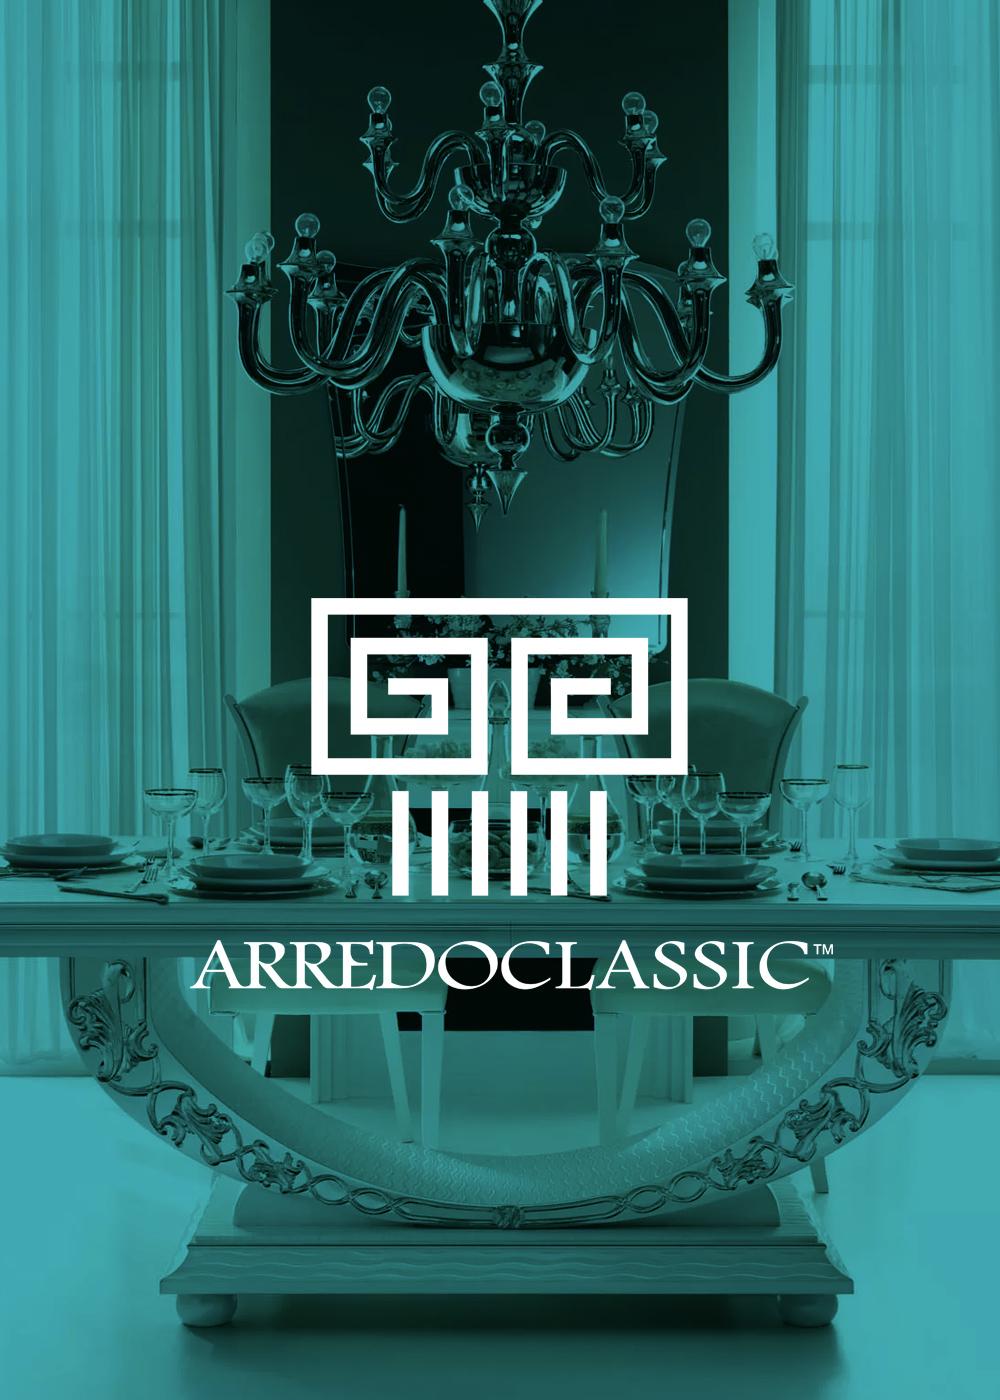 arredoclassic-advmedialab-01.jpg